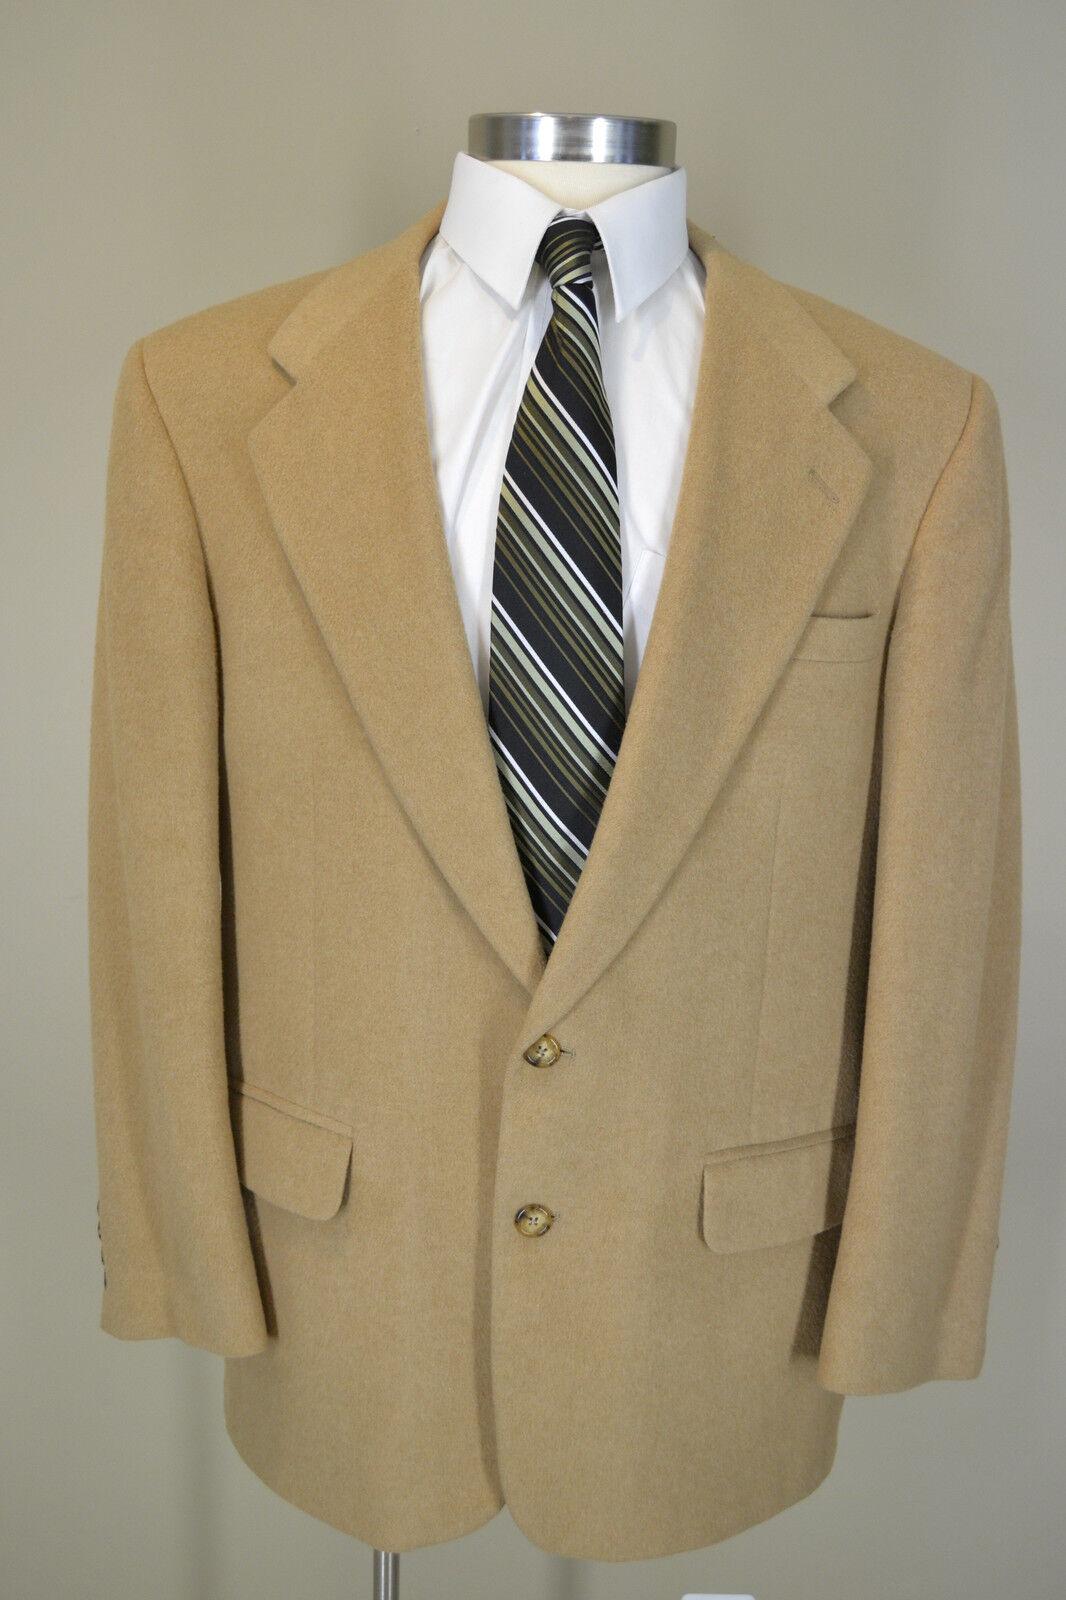 Geoffrey Beene Sharp Awesome Camel Hair Blazer Sport Coat  Größe 42 Regular